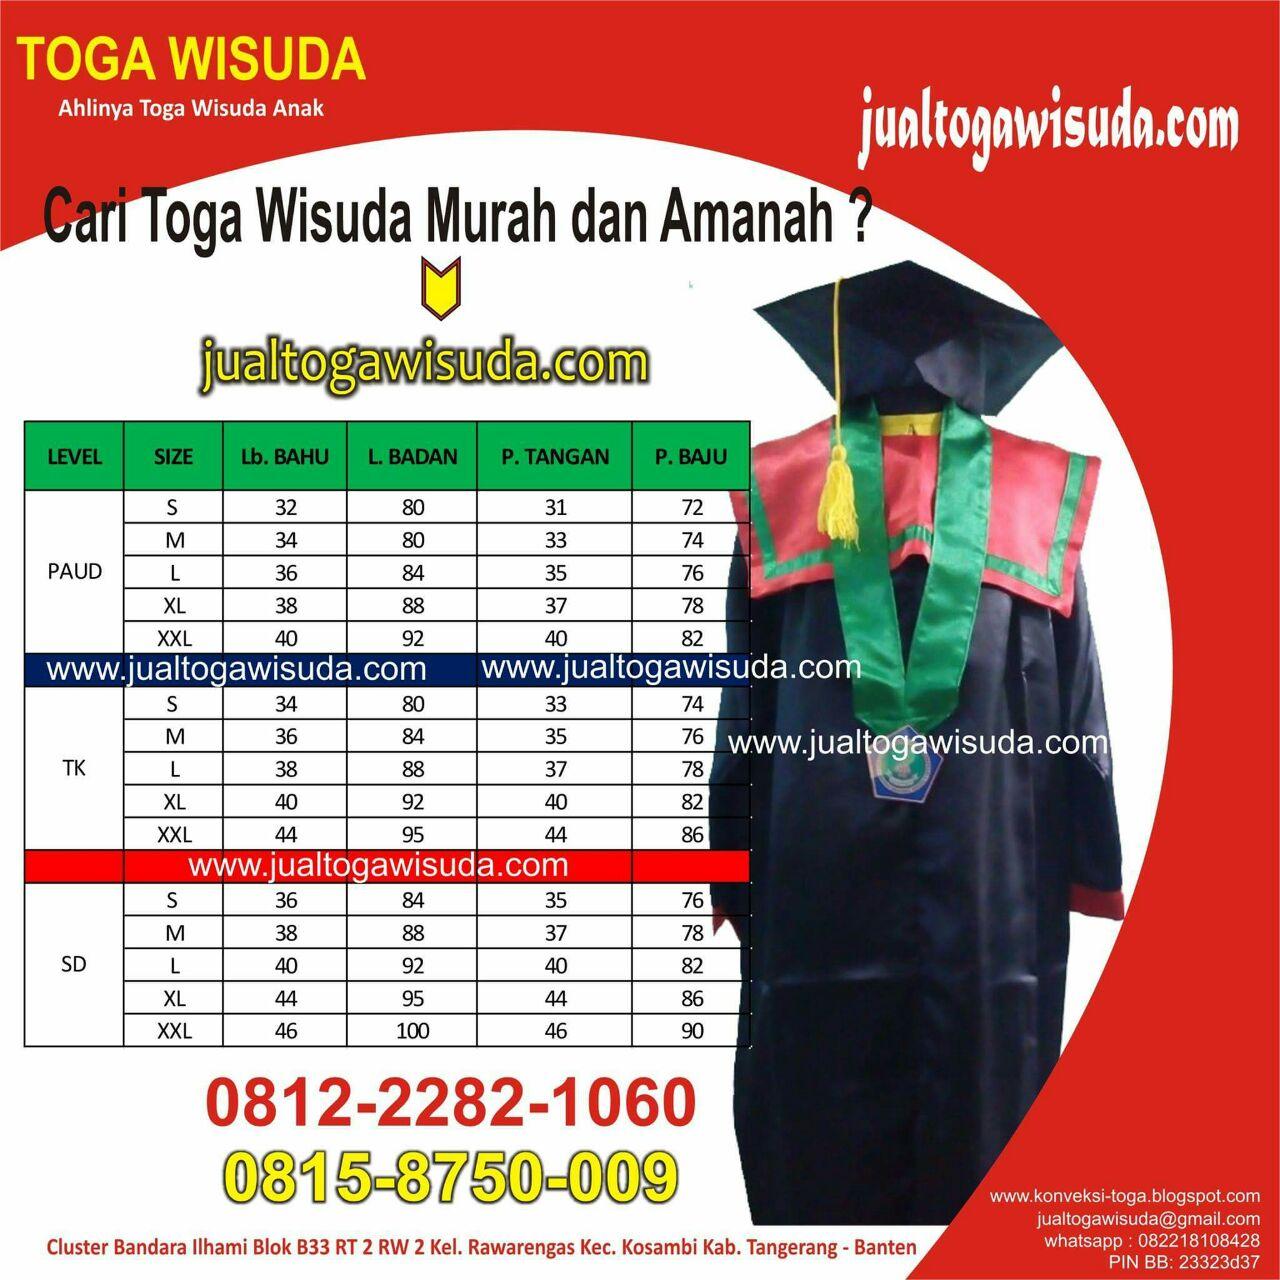 Ukuran Toga Wisuda Anak Lampung Utara